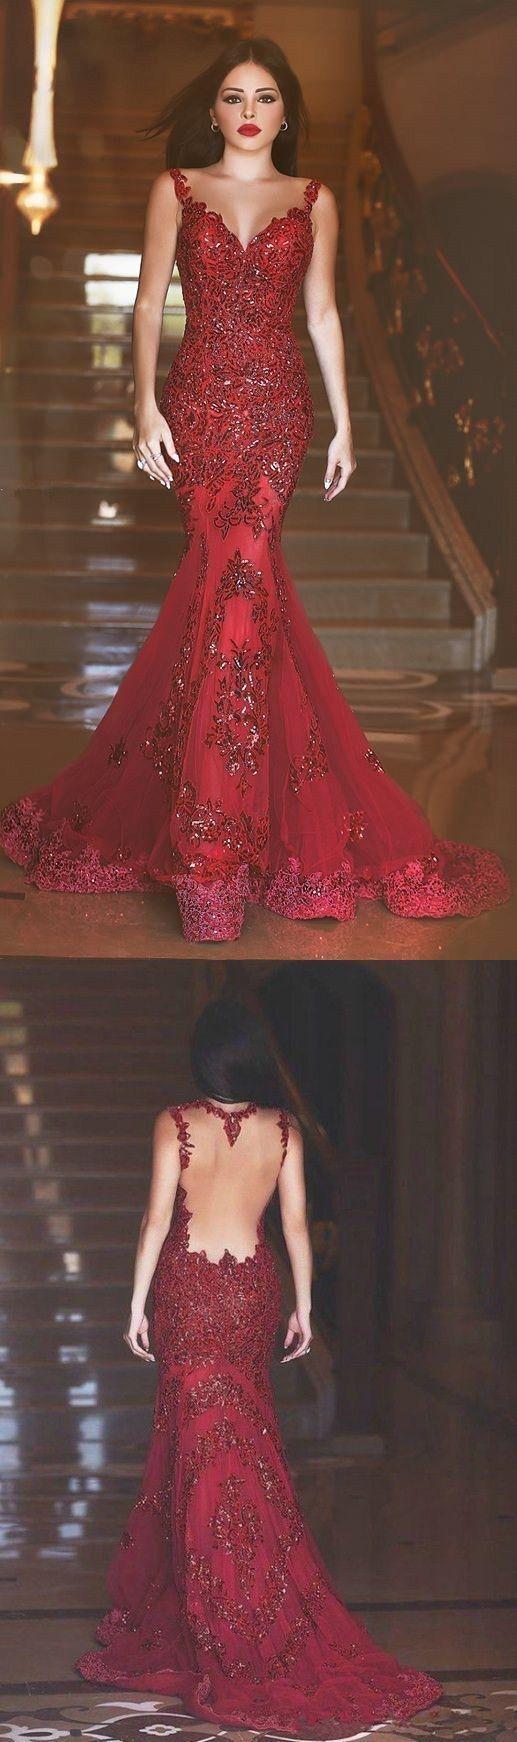 Mermaid backless burgundy prom dress wedding dress evening dresses